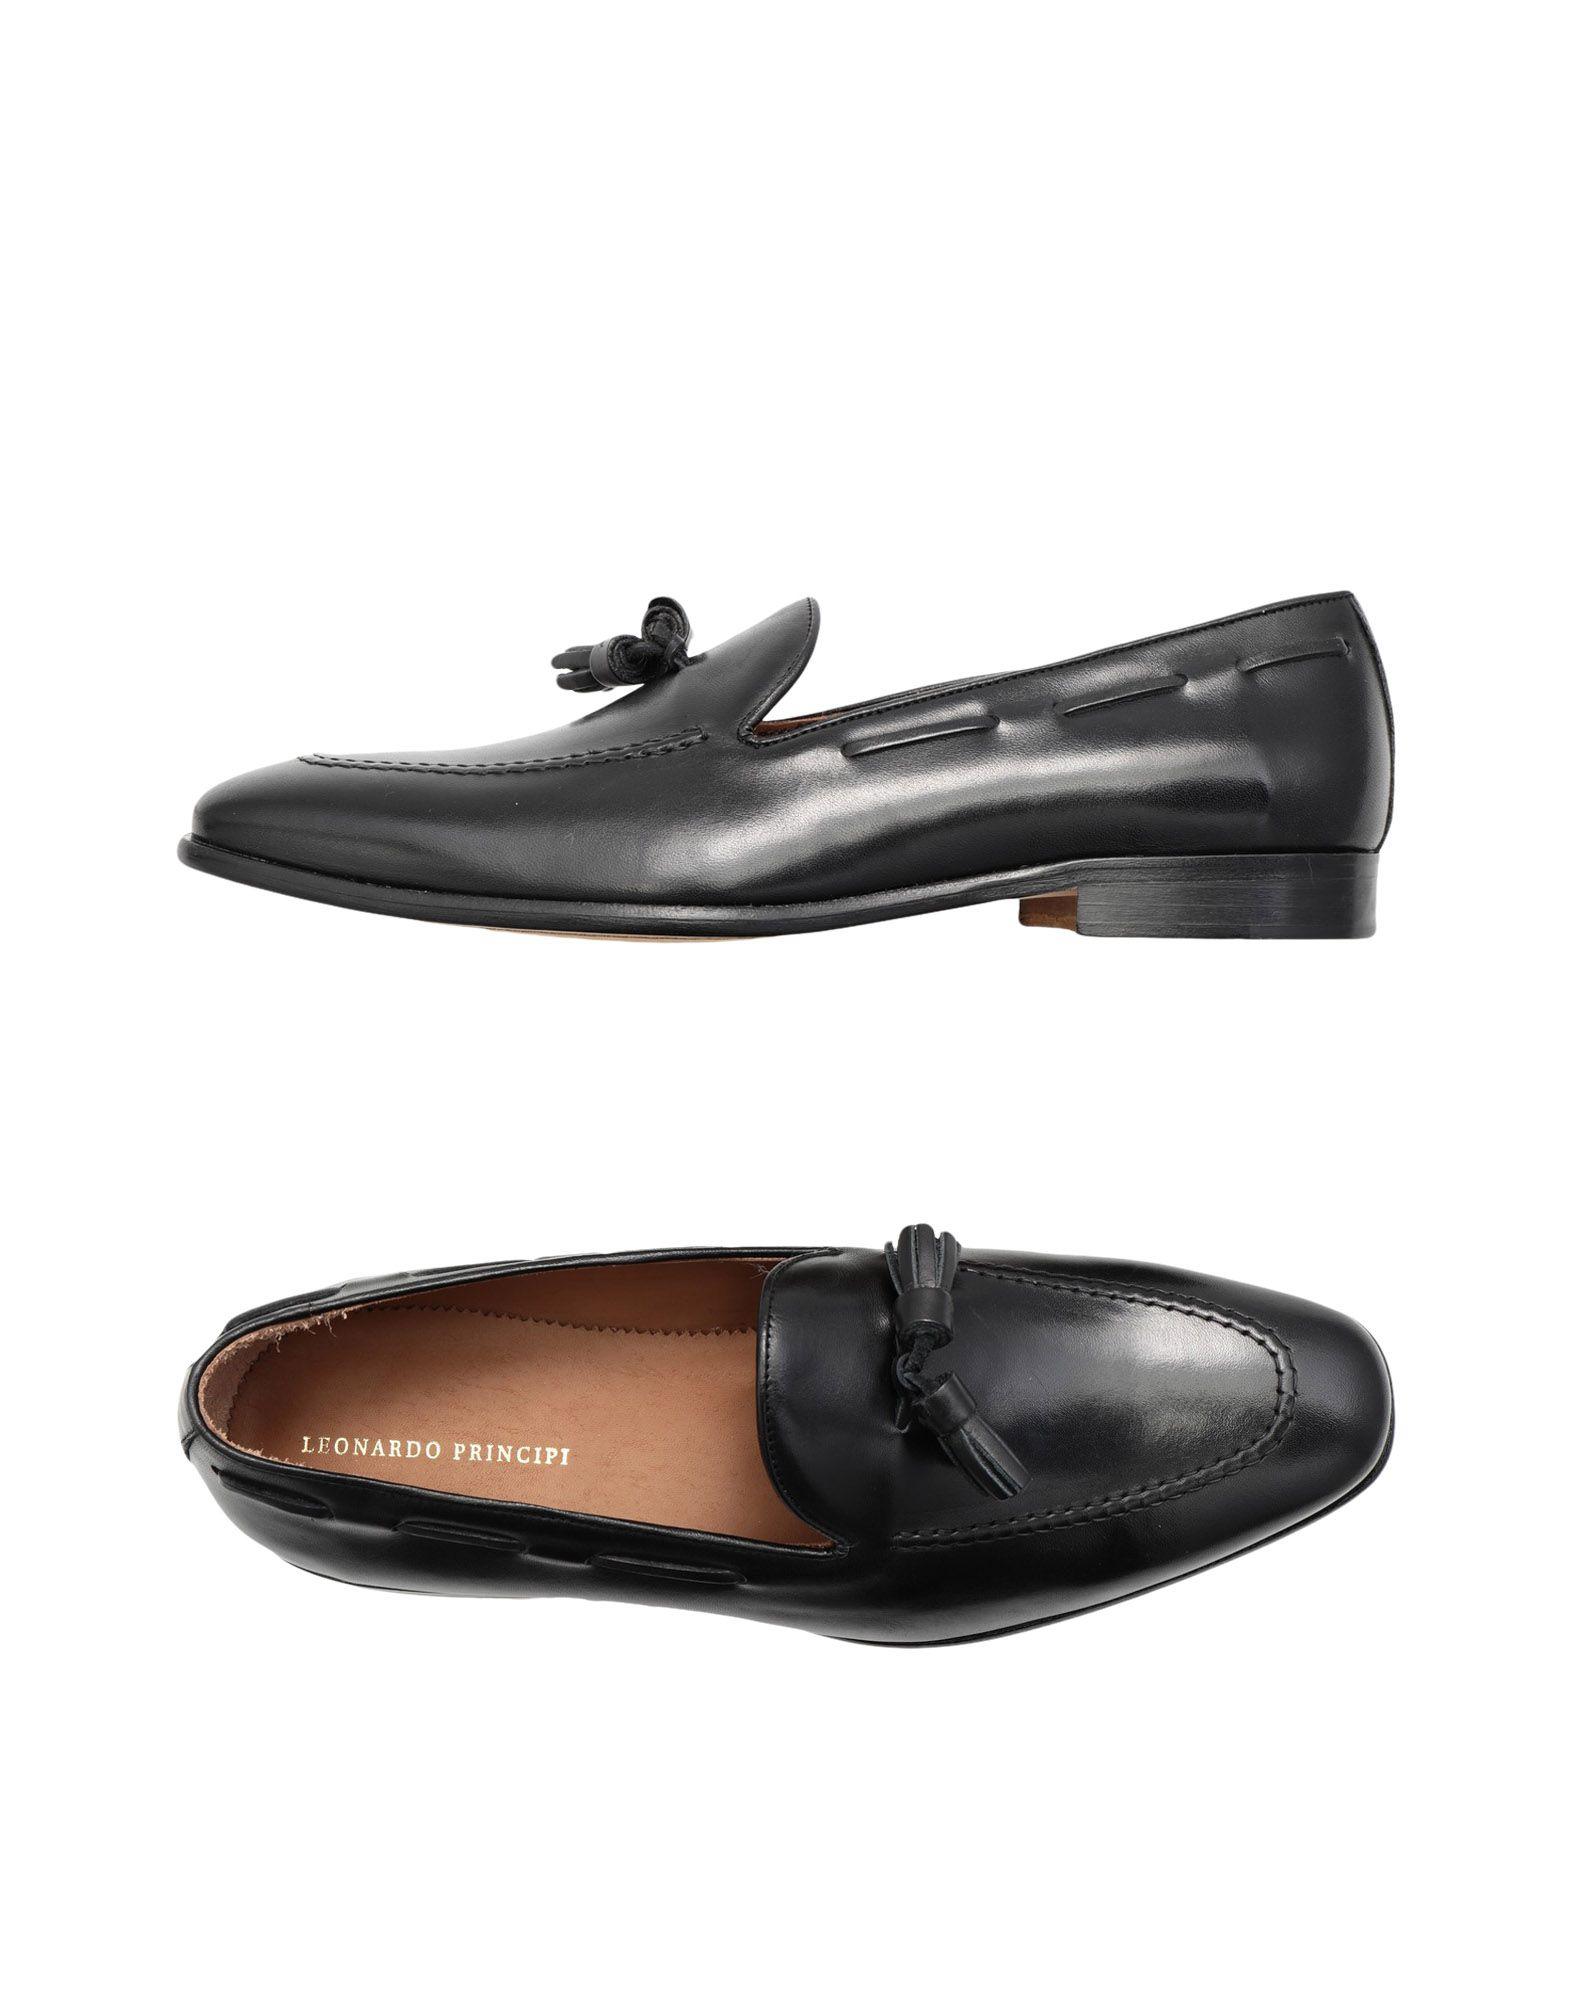 Leonardo Principi Mokassins Herren  11524307PO Gute Qualität beliebte Schuhe